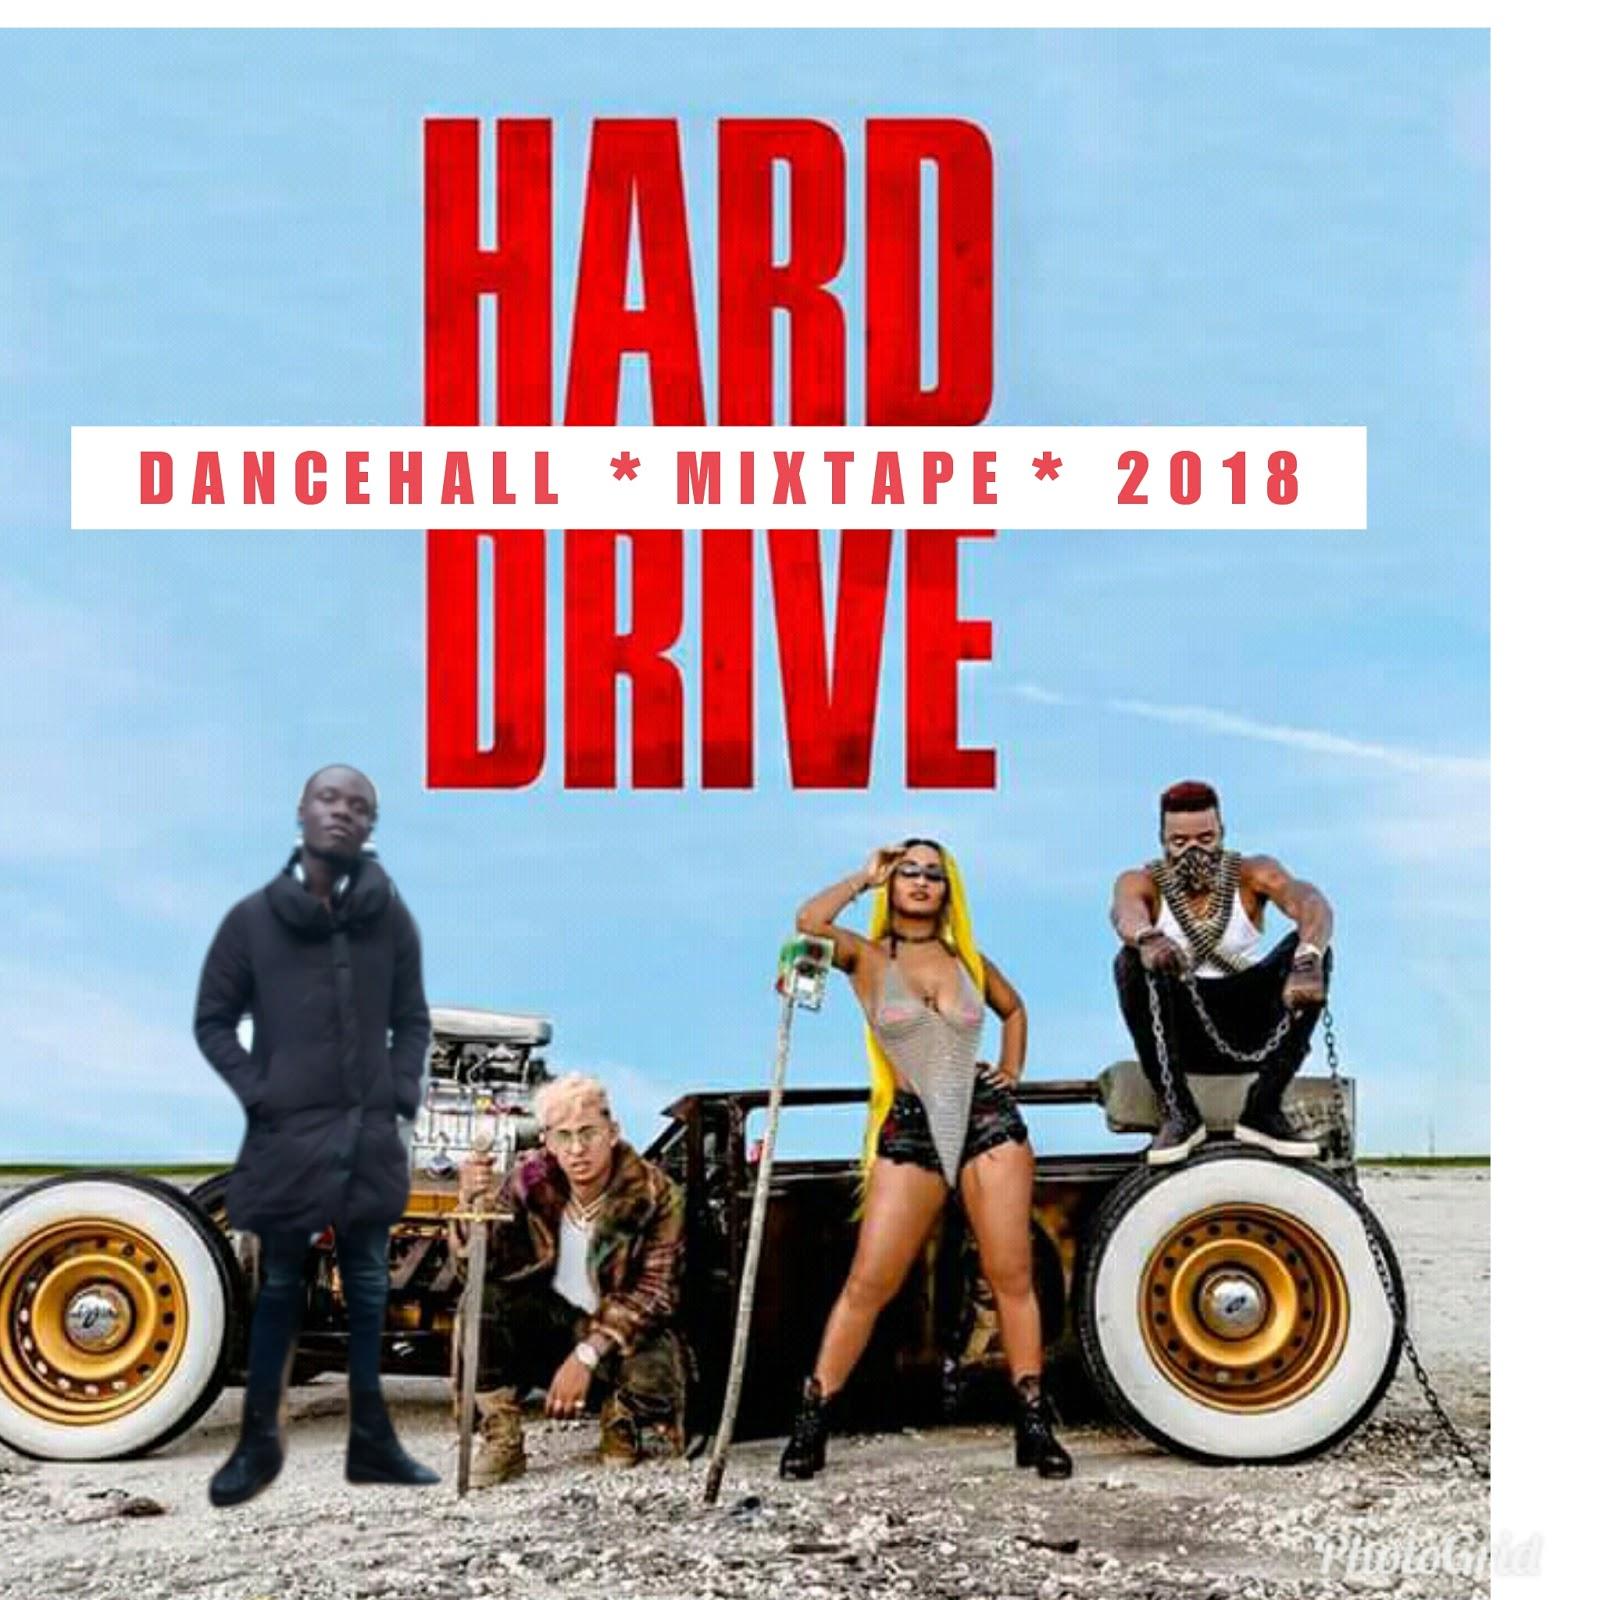 DJ LYTMAS - HARD DRIVE DANCEHALL MIX 2018 - DJ LYTMAS OFFICIAL WEBSITE